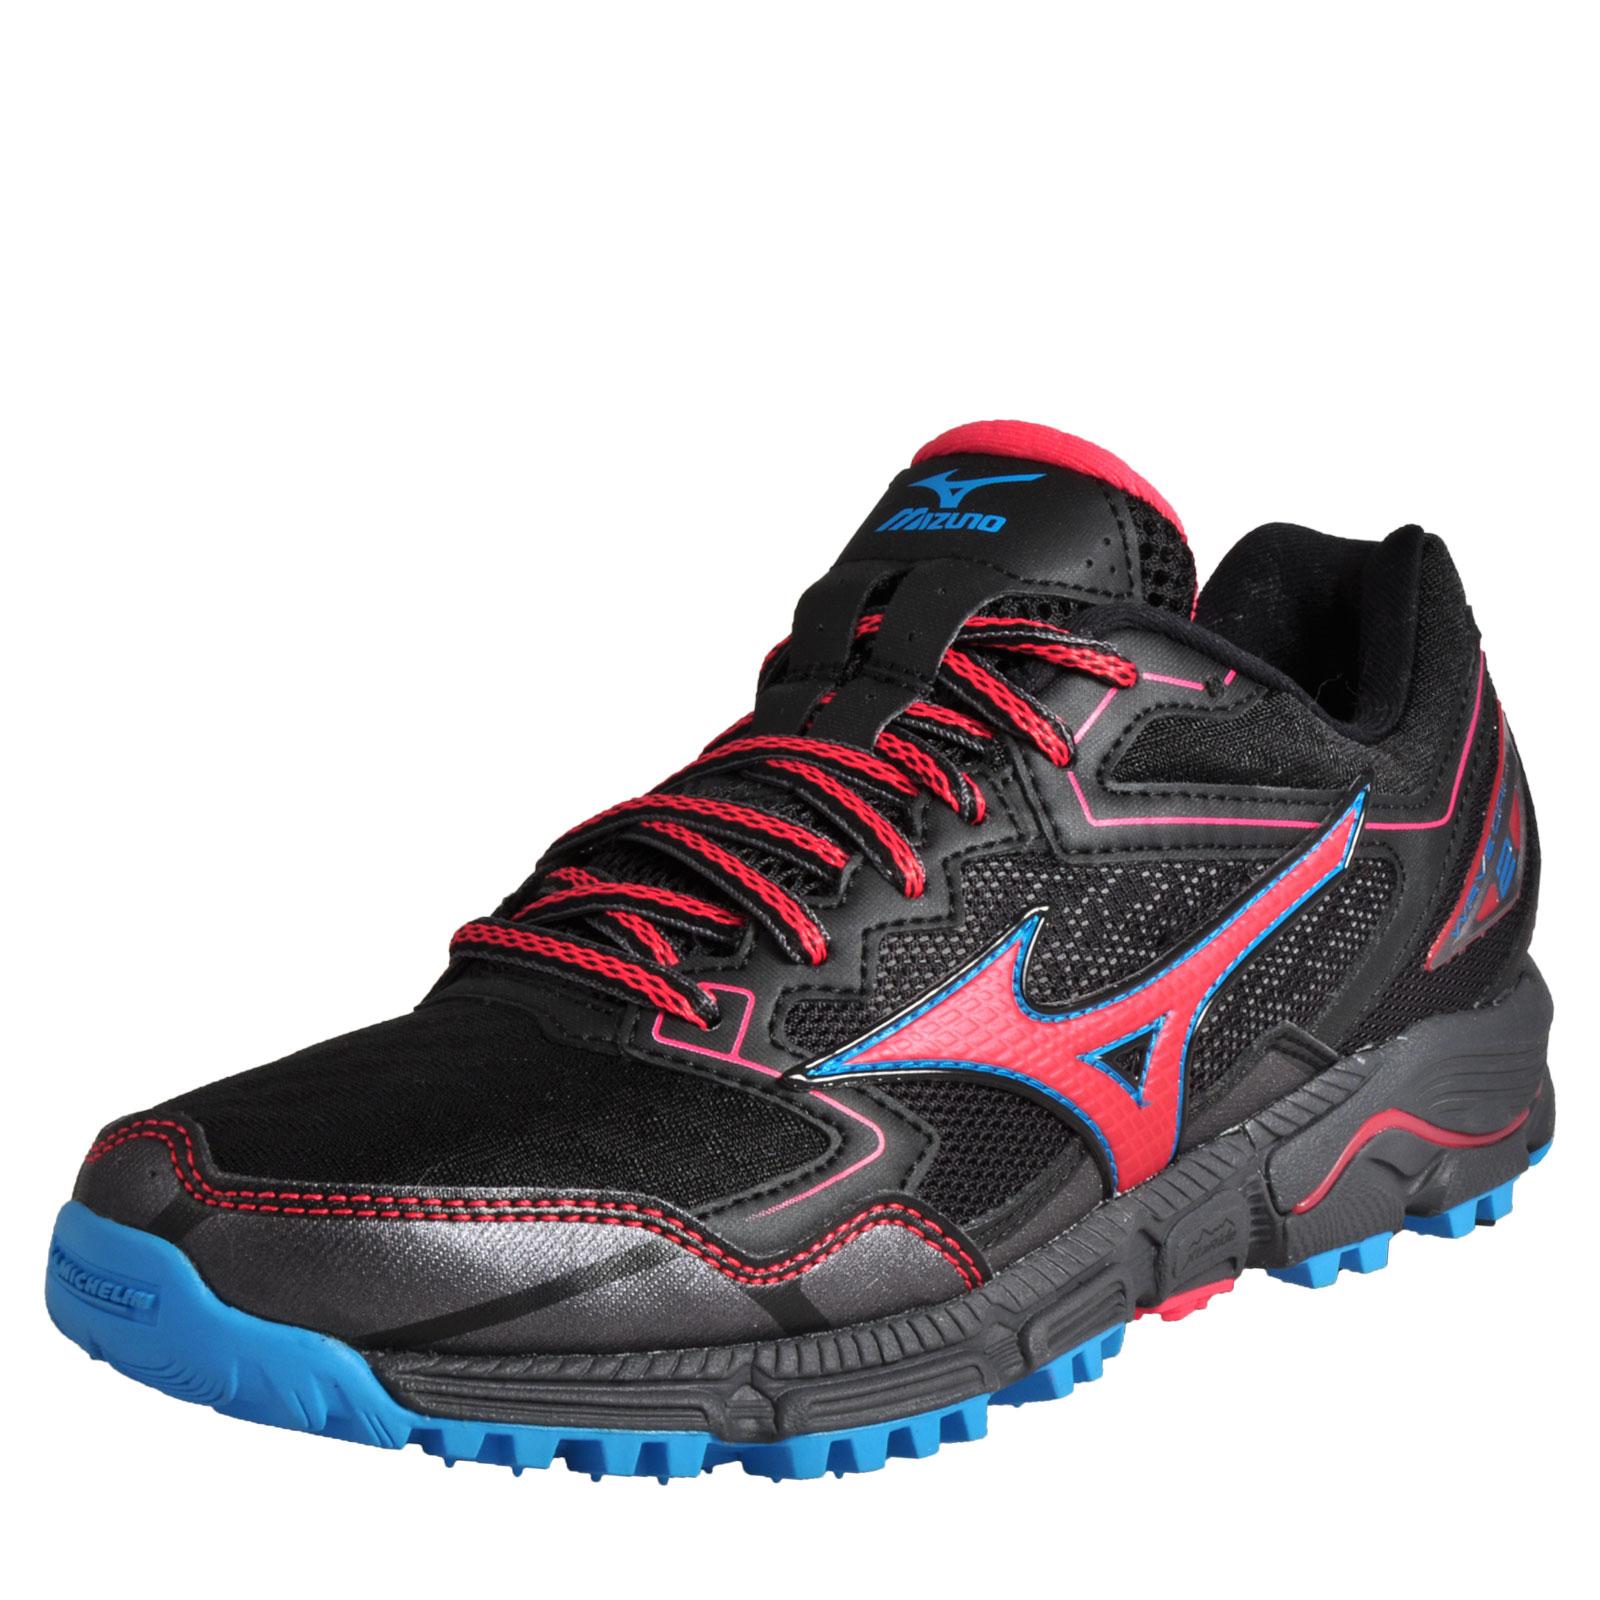 half off 5d9cb eea3c Details about Mizuno Wave Daichi 2 Womens Premium All Terrain Off Road  Running Shoes Black